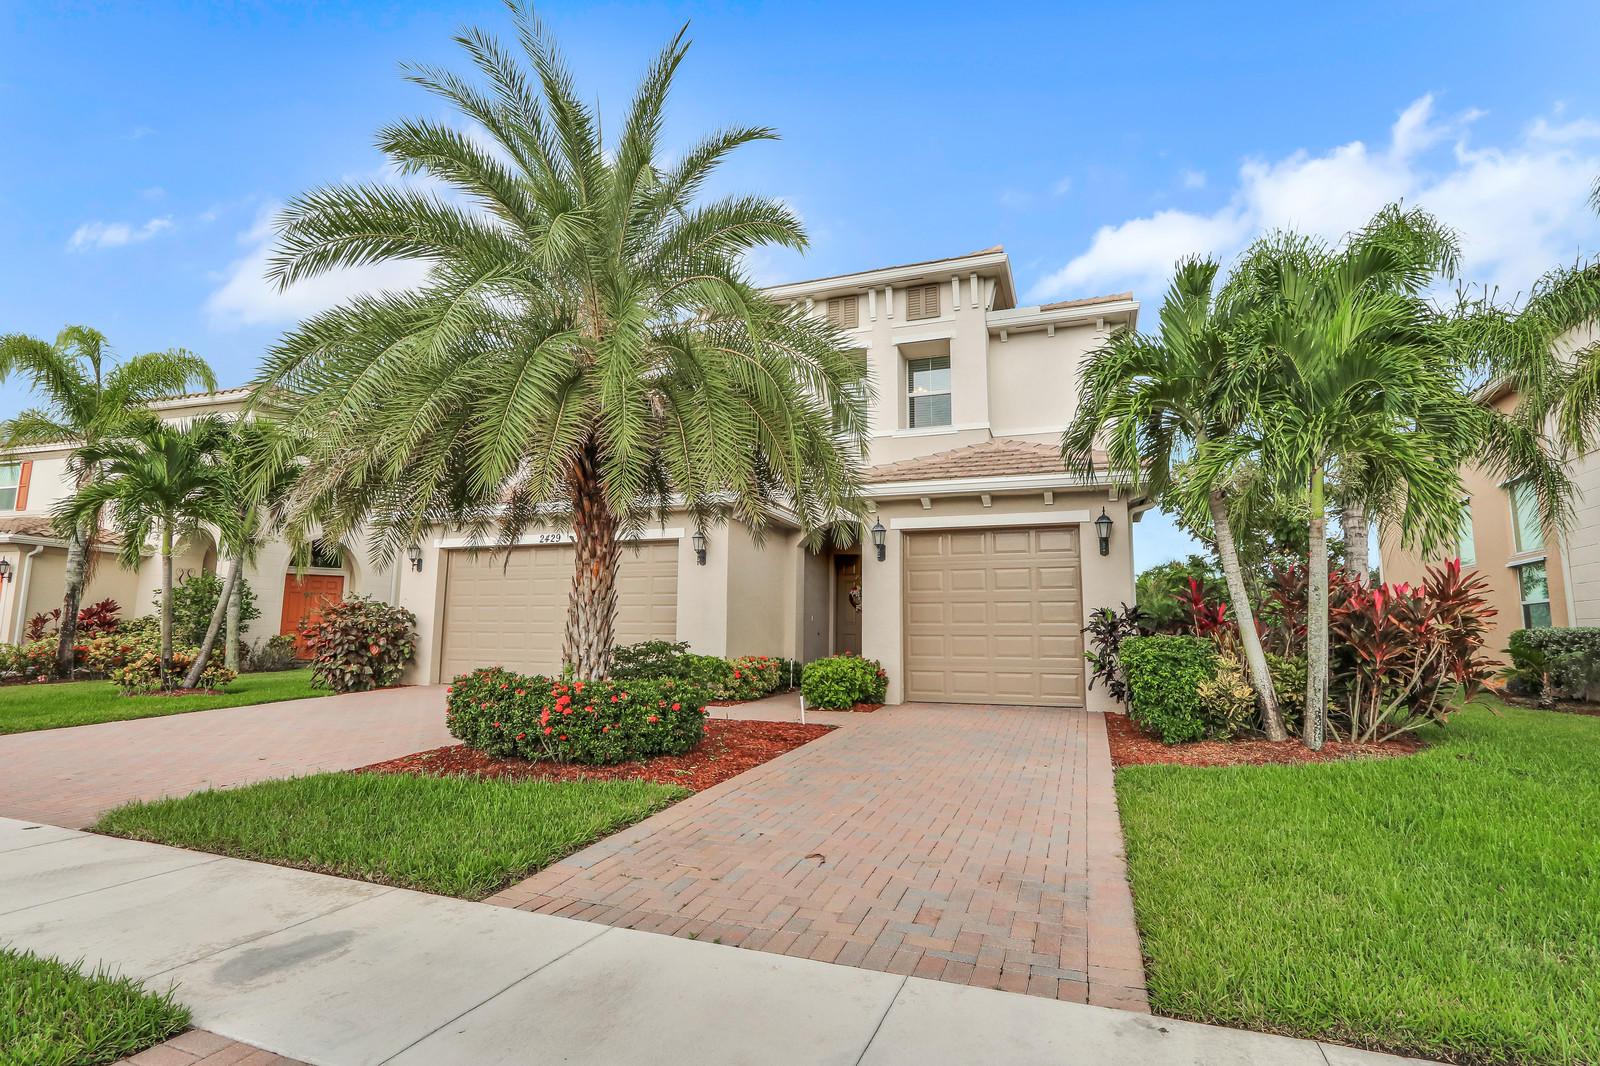 Photo of 2429 Bellarosa Circle, Royal Palm Beach, FL 33411